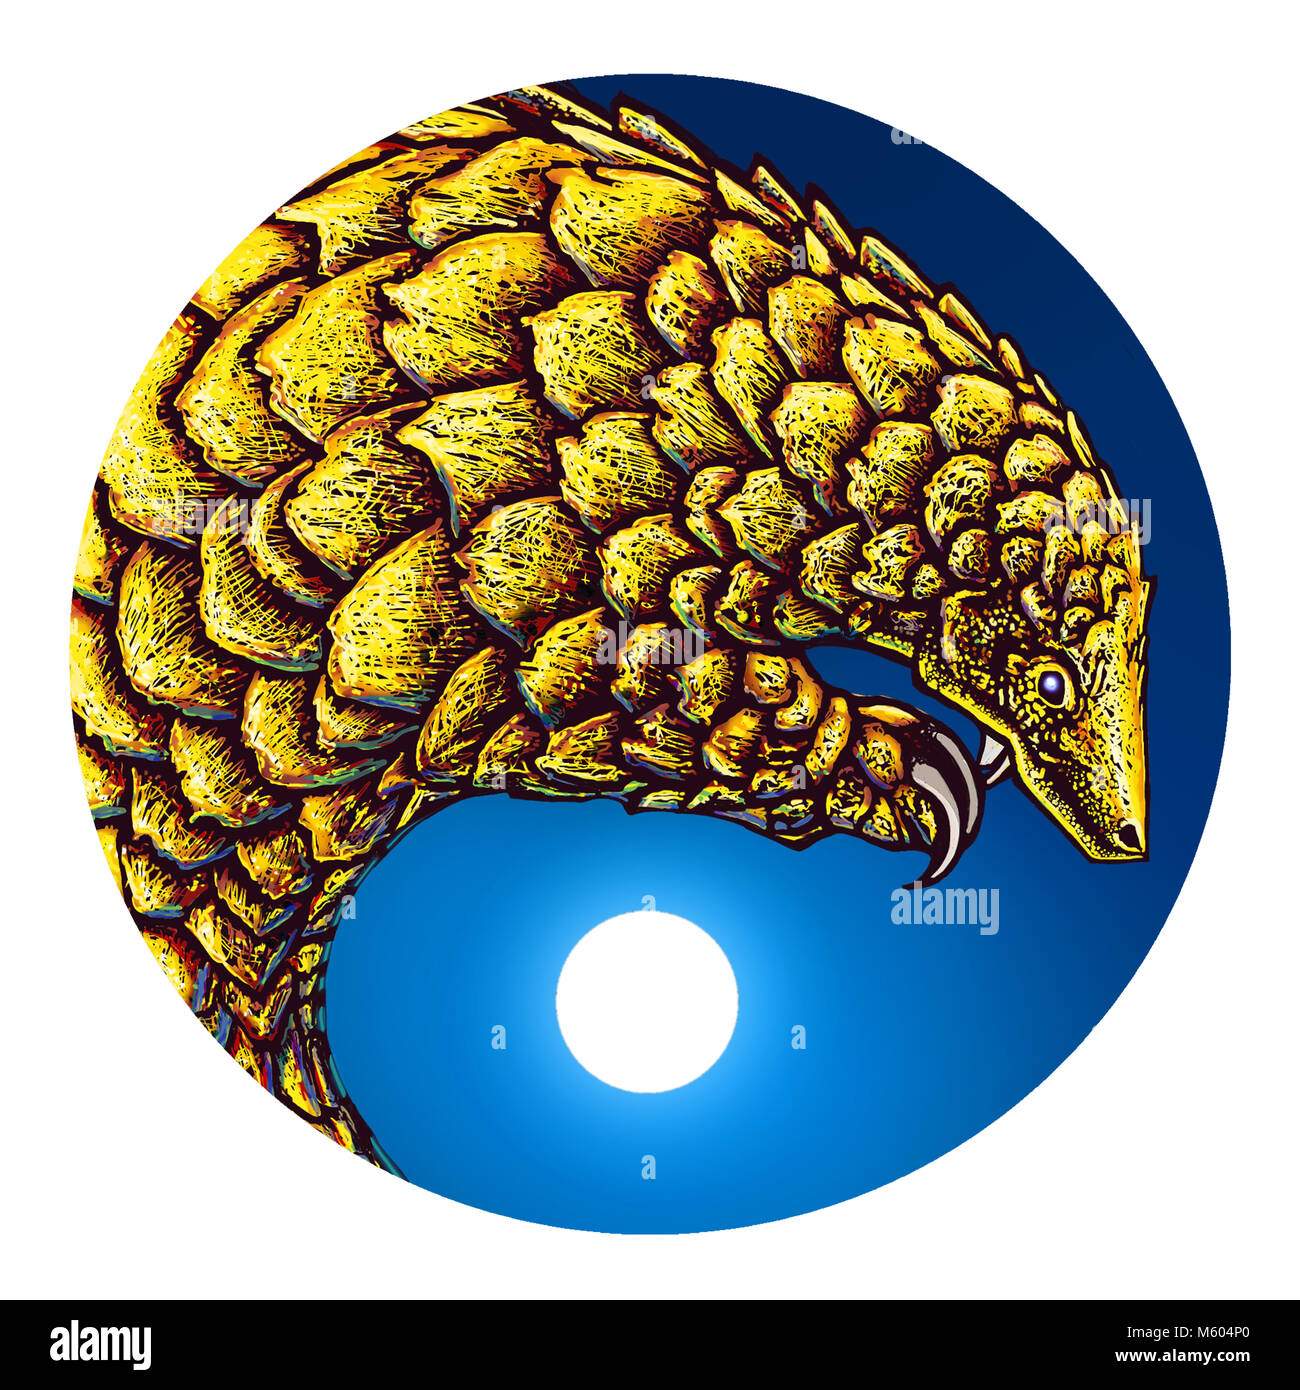 Illustration of a Pangolin. - Stock Image